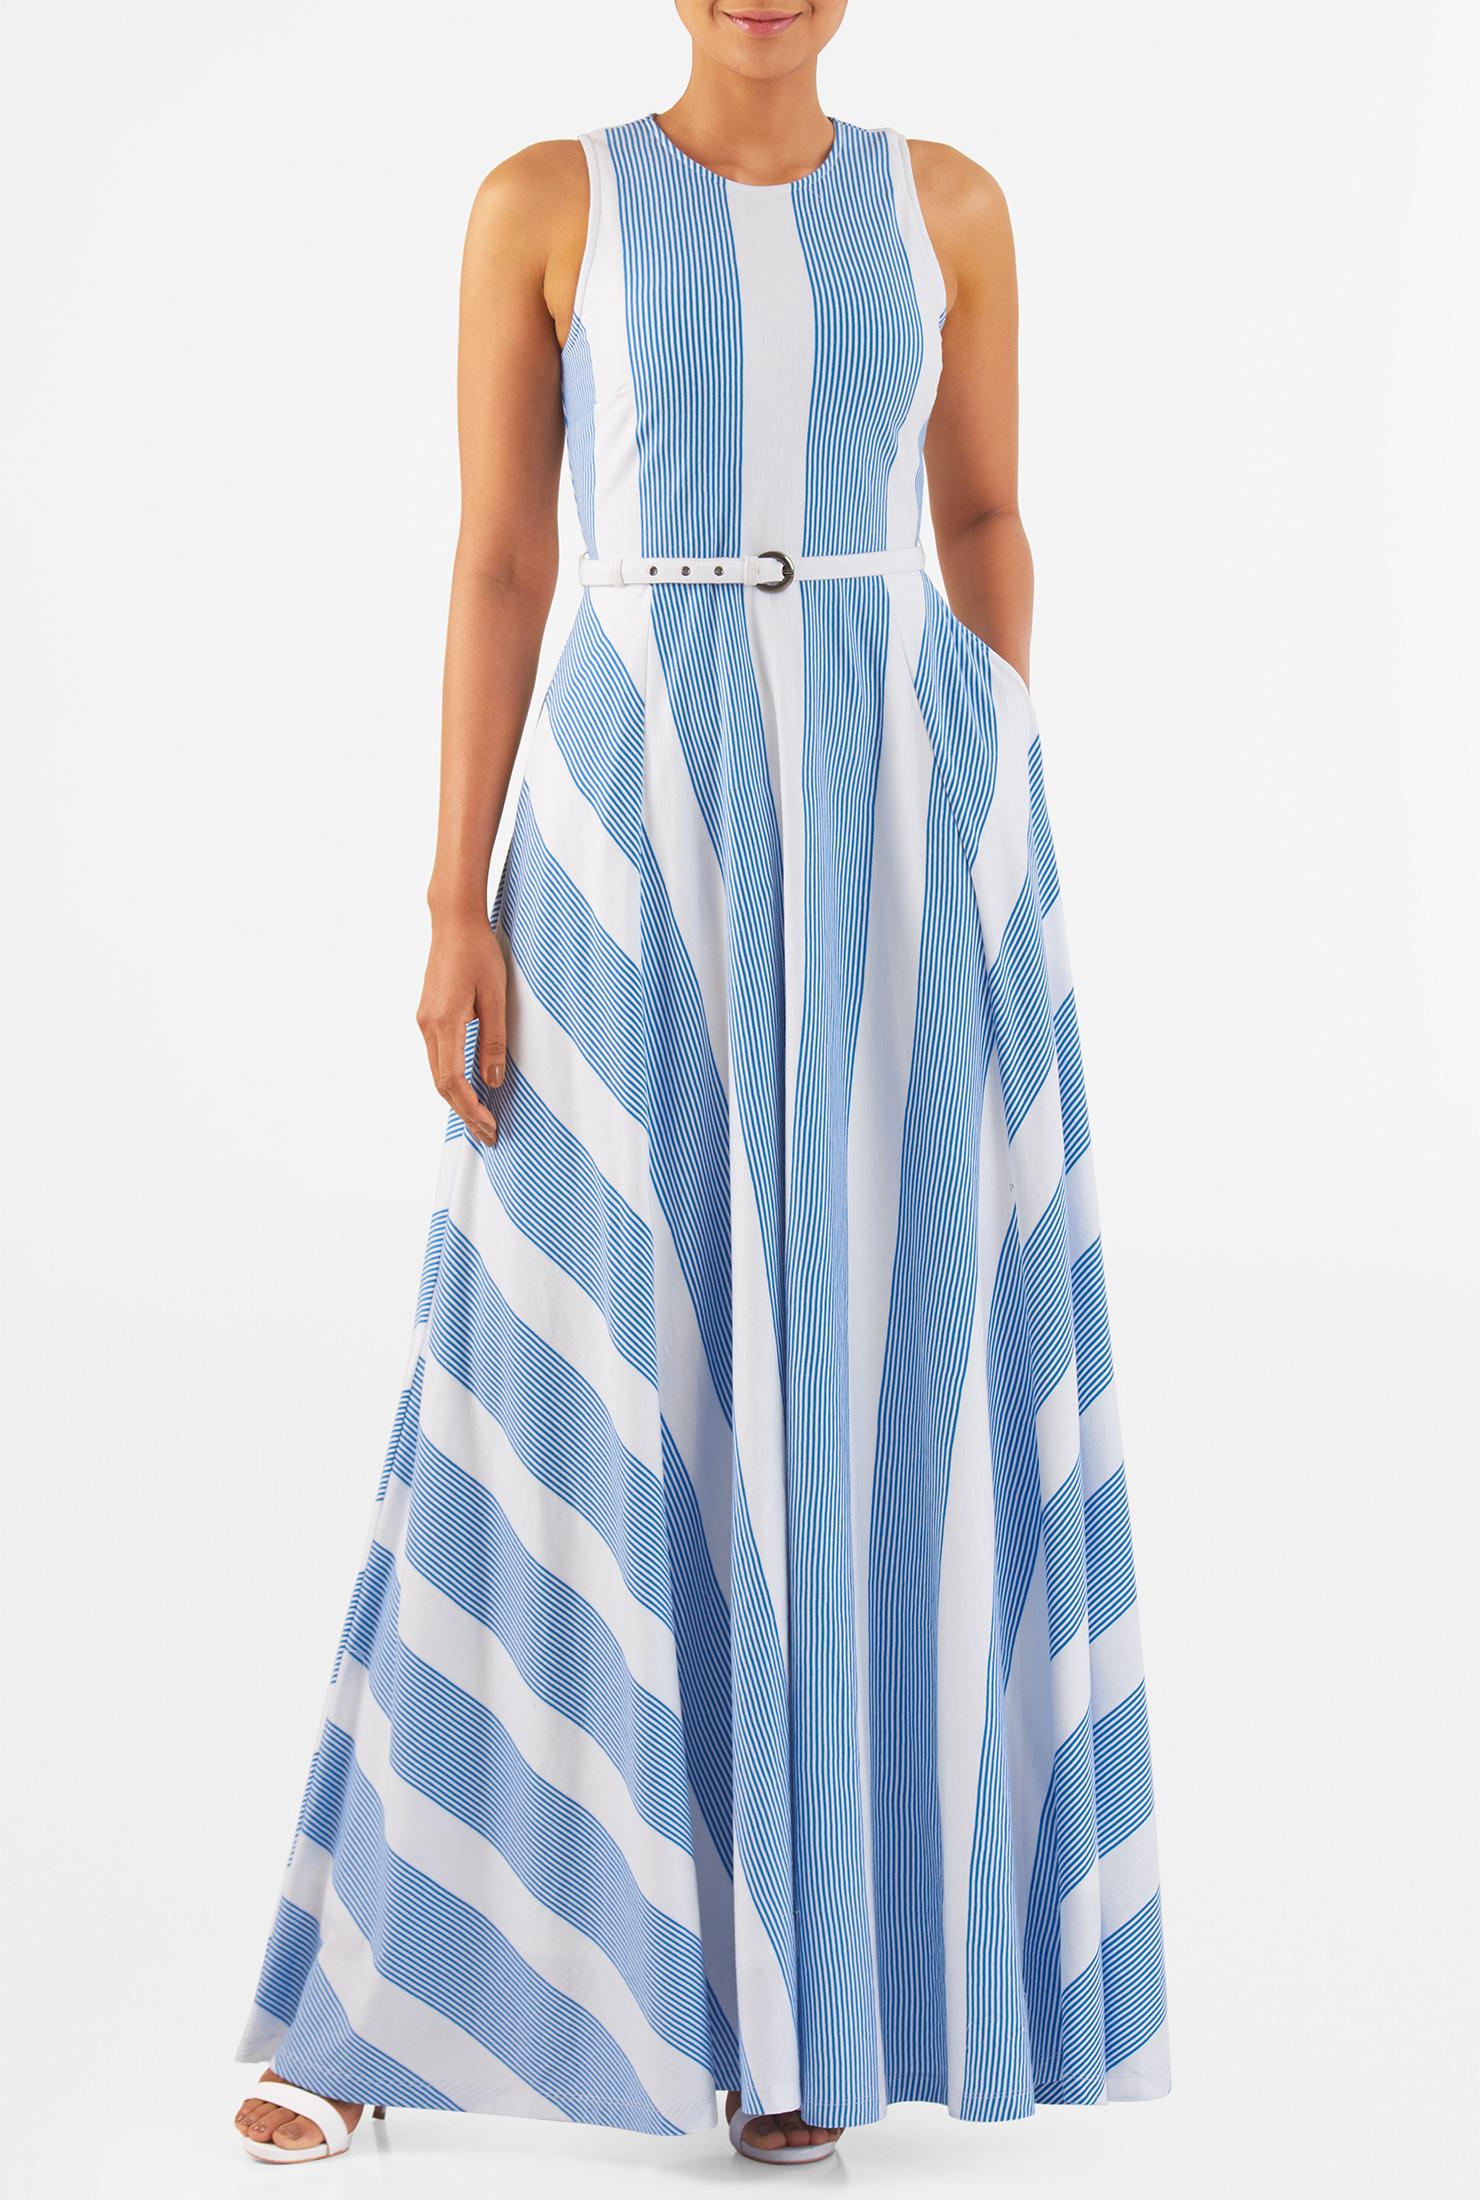 79e7dcdec142 Women s Fashion Clothing 0-36W and Custom